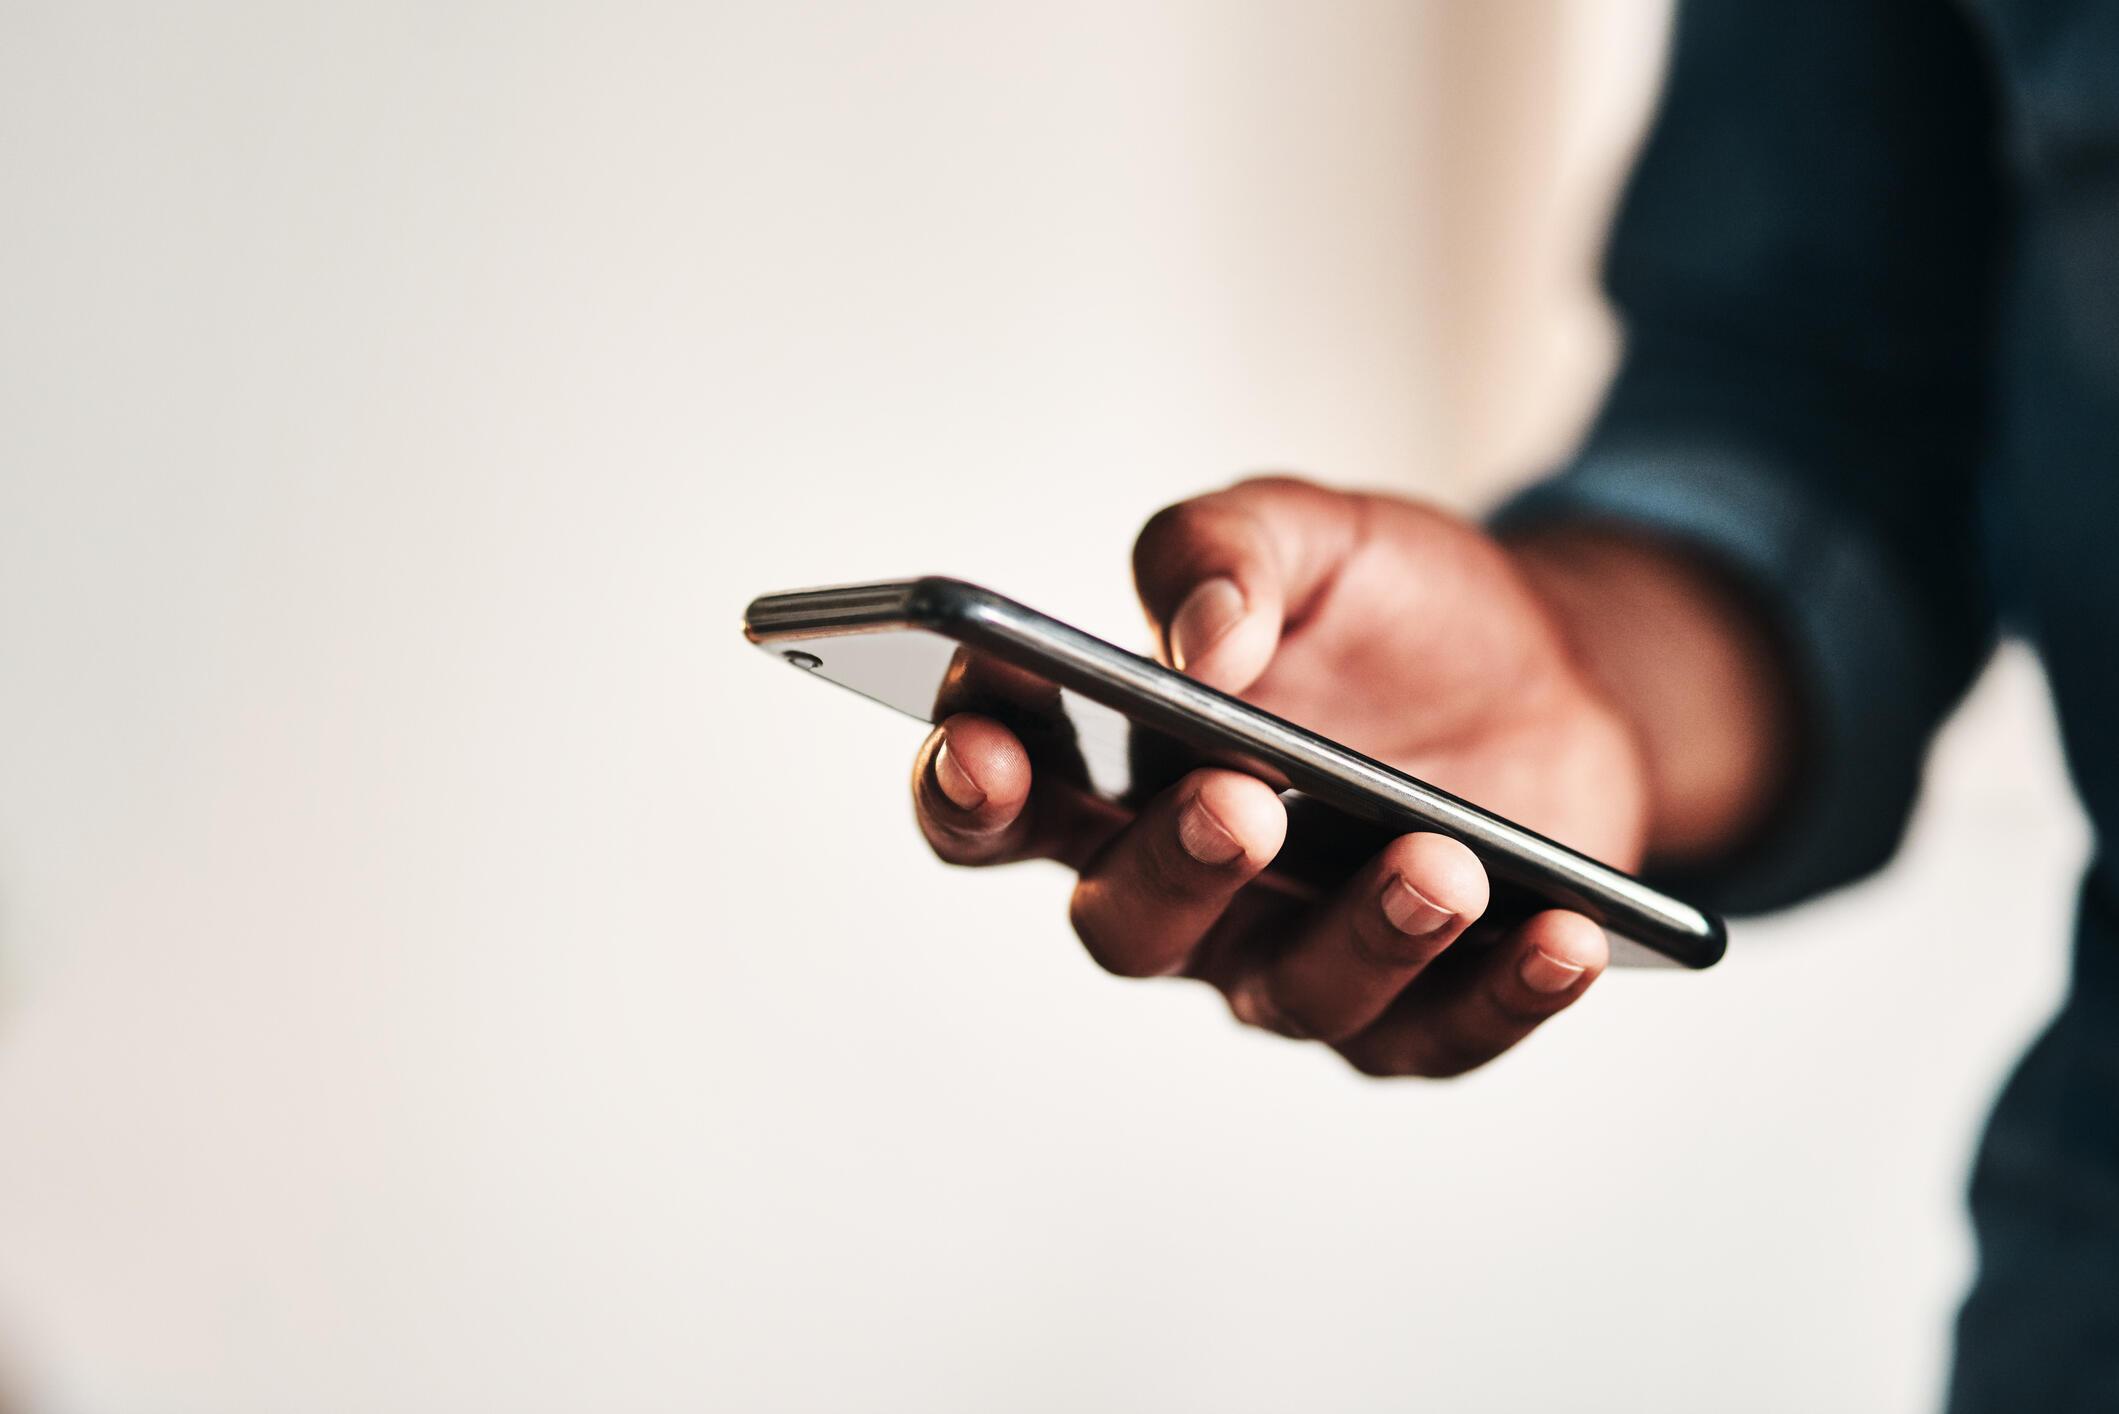 Smartphone - Internet - Téléphone - Afrique - iStock-1187582529